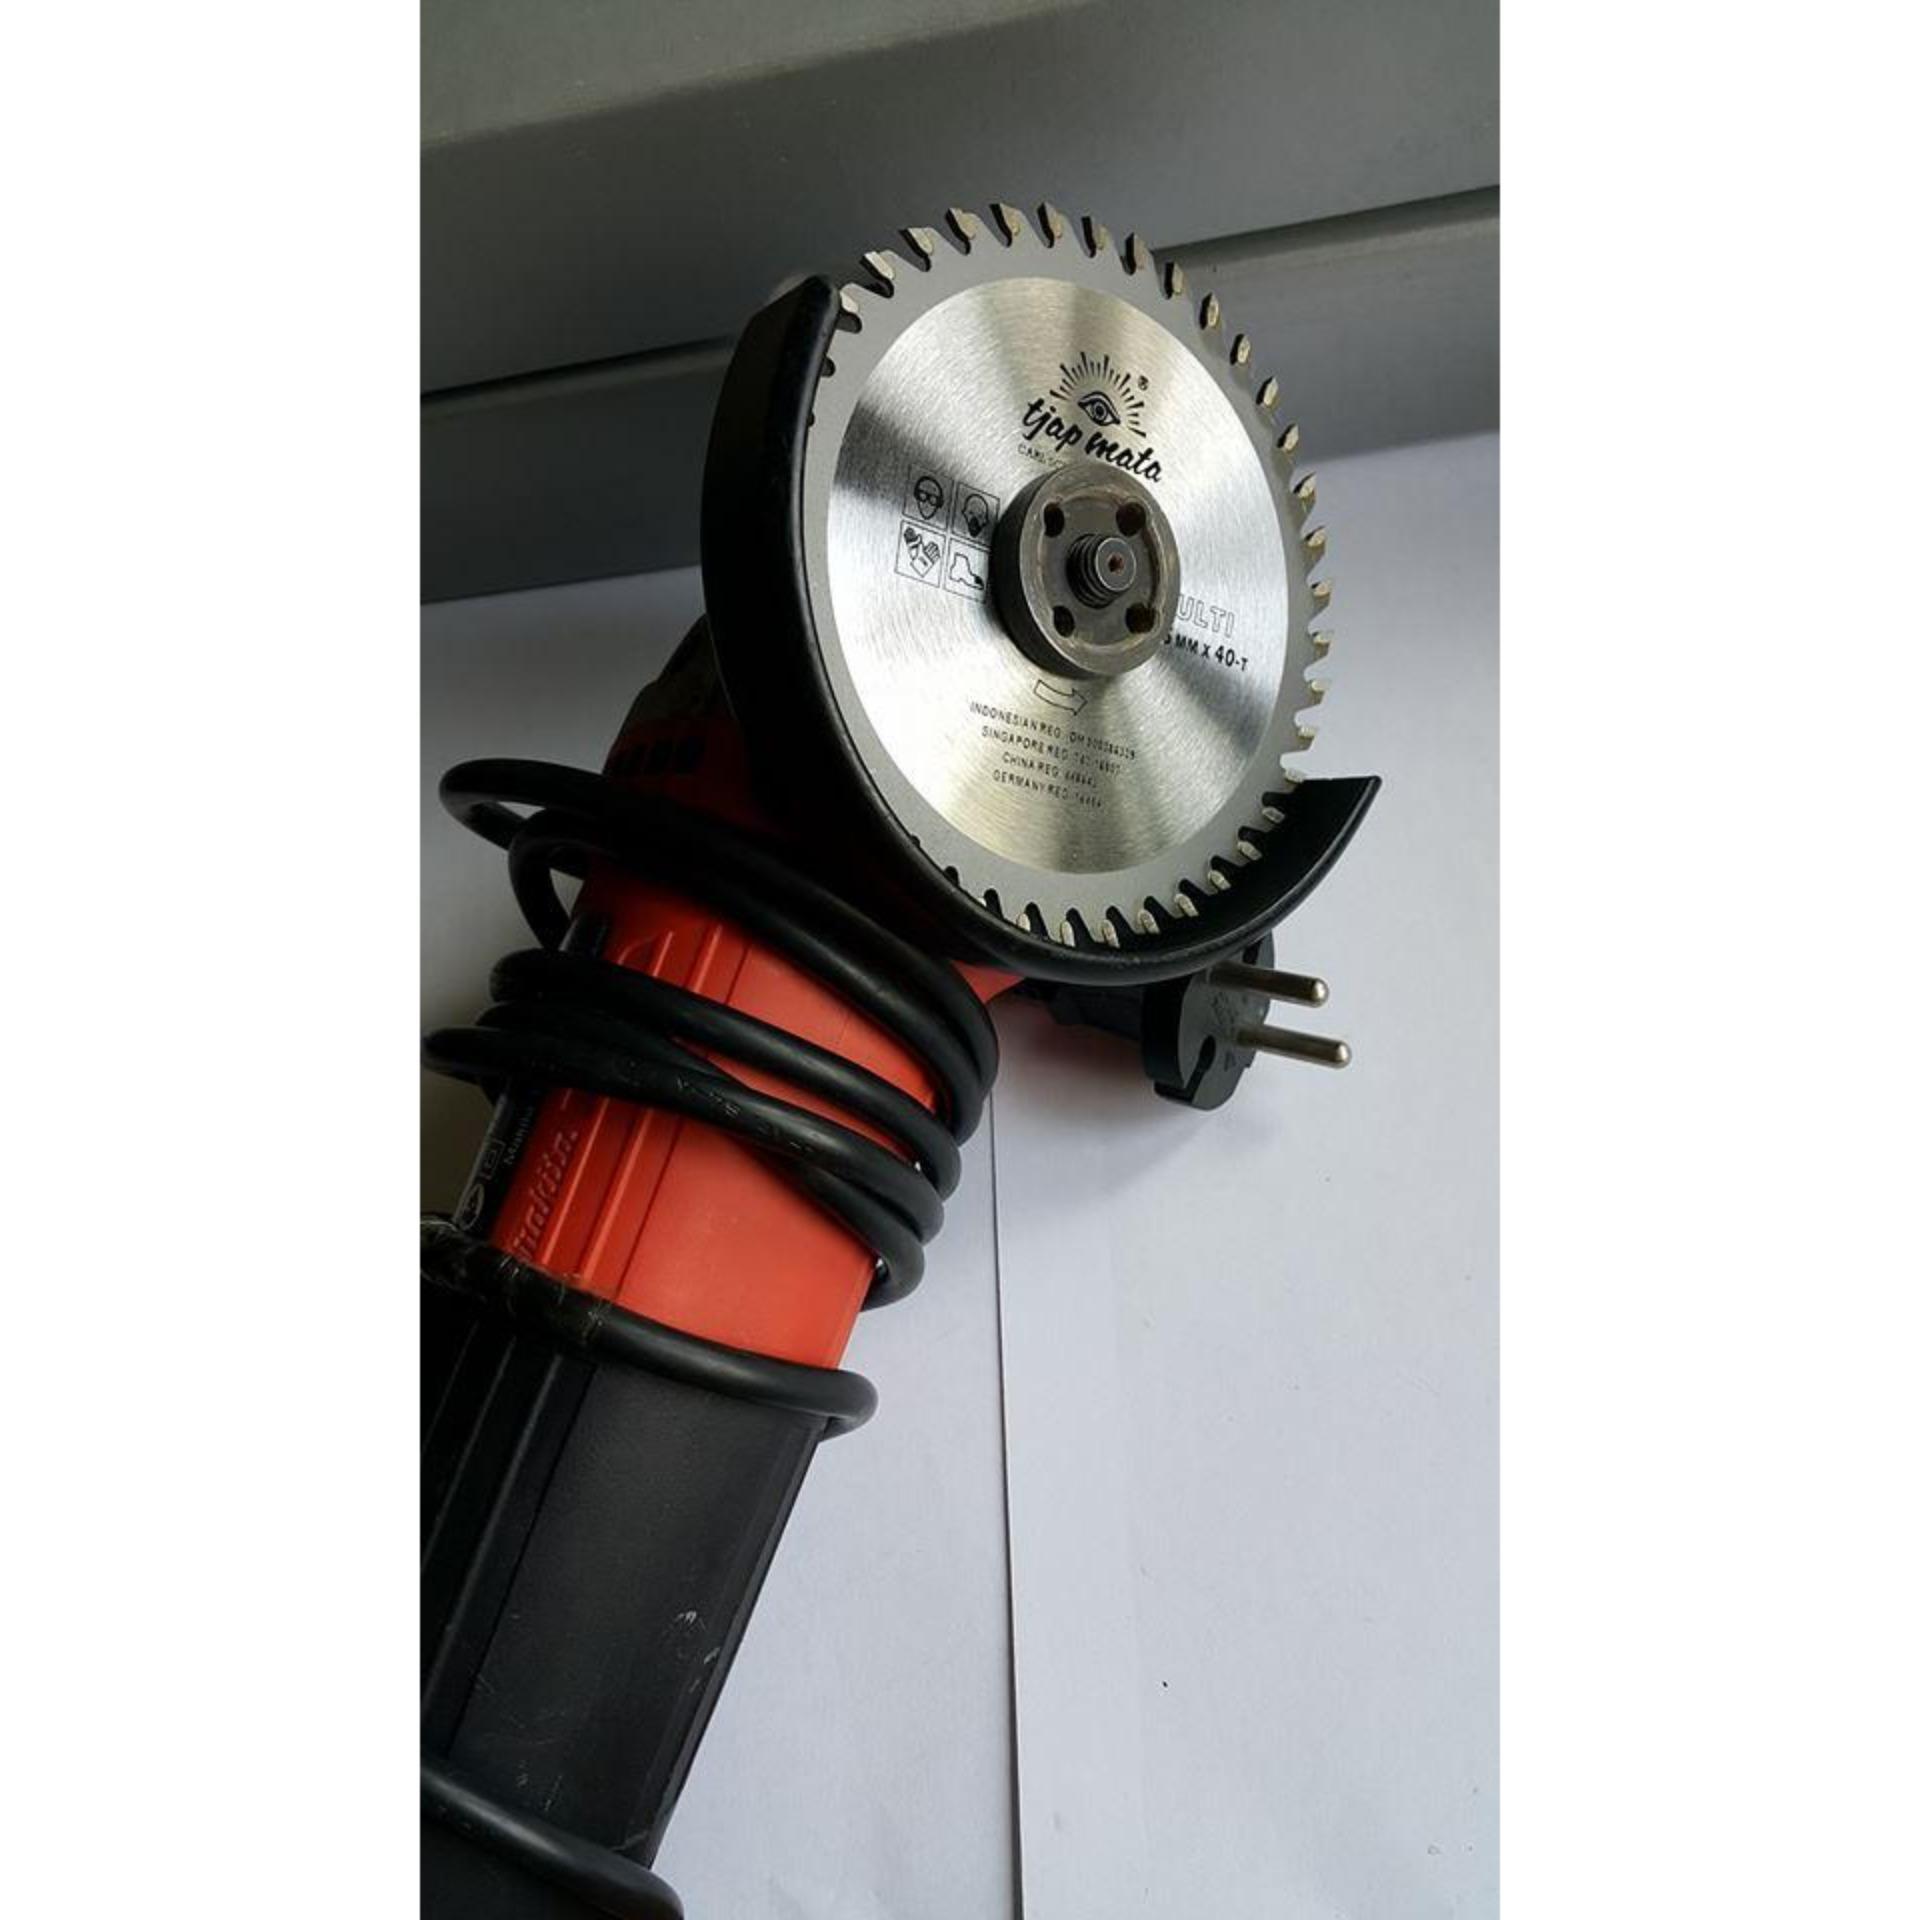 Cek Harga Baru Mata Gergaji Potong Besi Tip Saw I Tjap Germany Jigsaw Bosch T 118 A Jig Blade T118a Bulat Tct Dan Belah Eye Brand 3